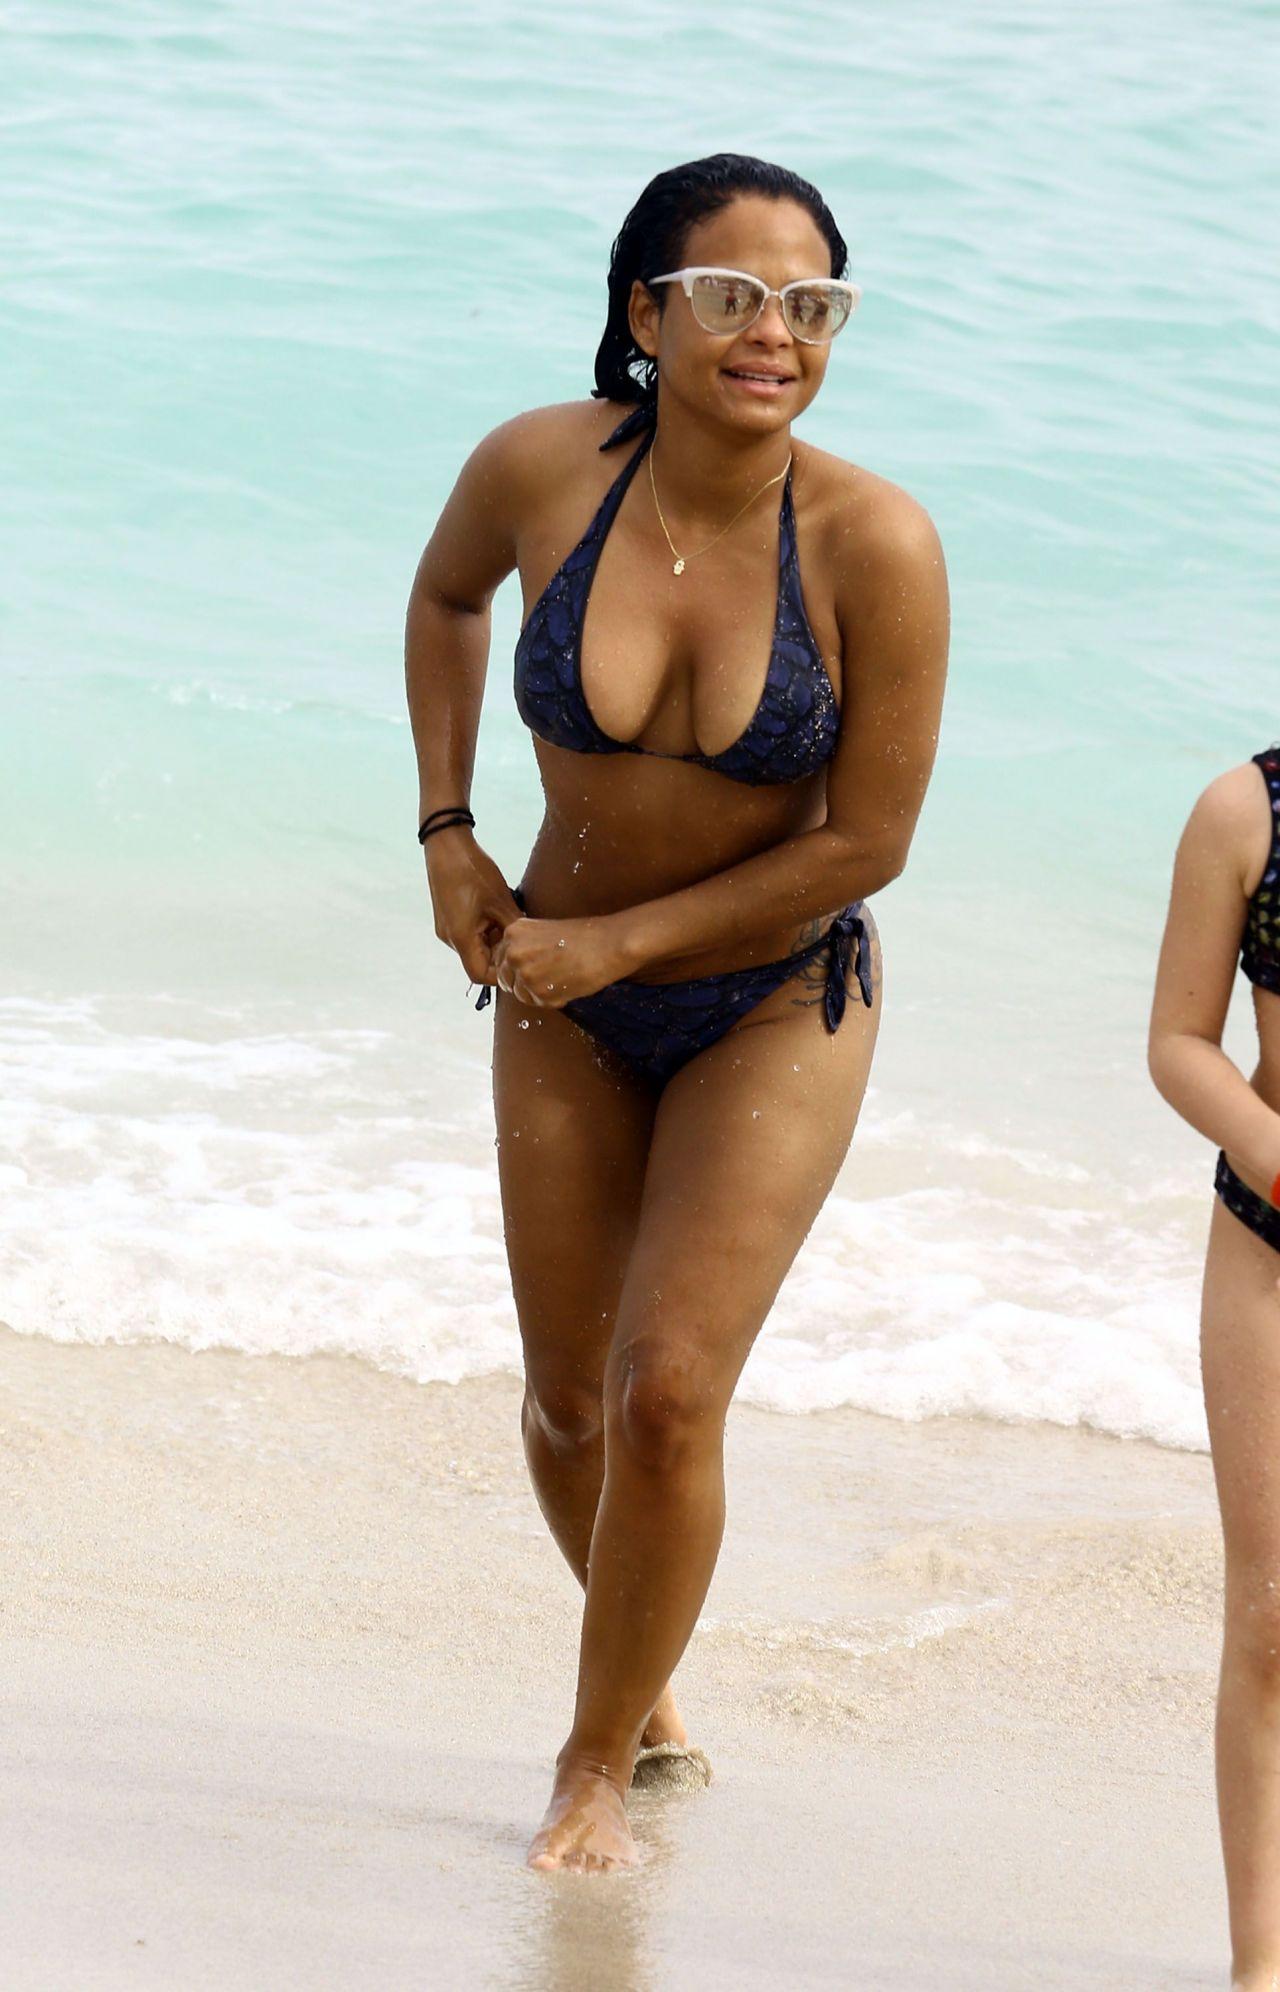 Christina milian sexy beach bikini selfie vid 4